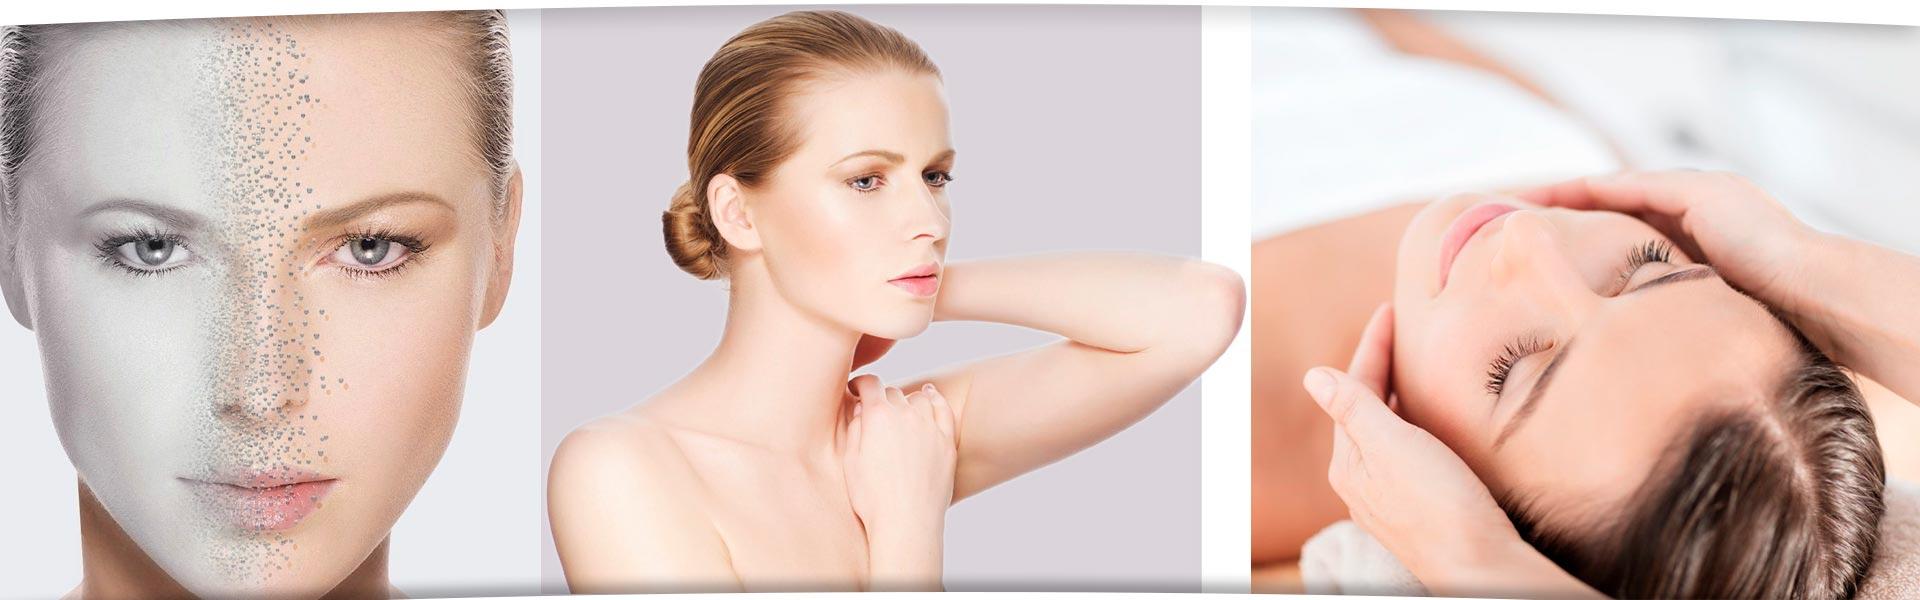 slider skin care